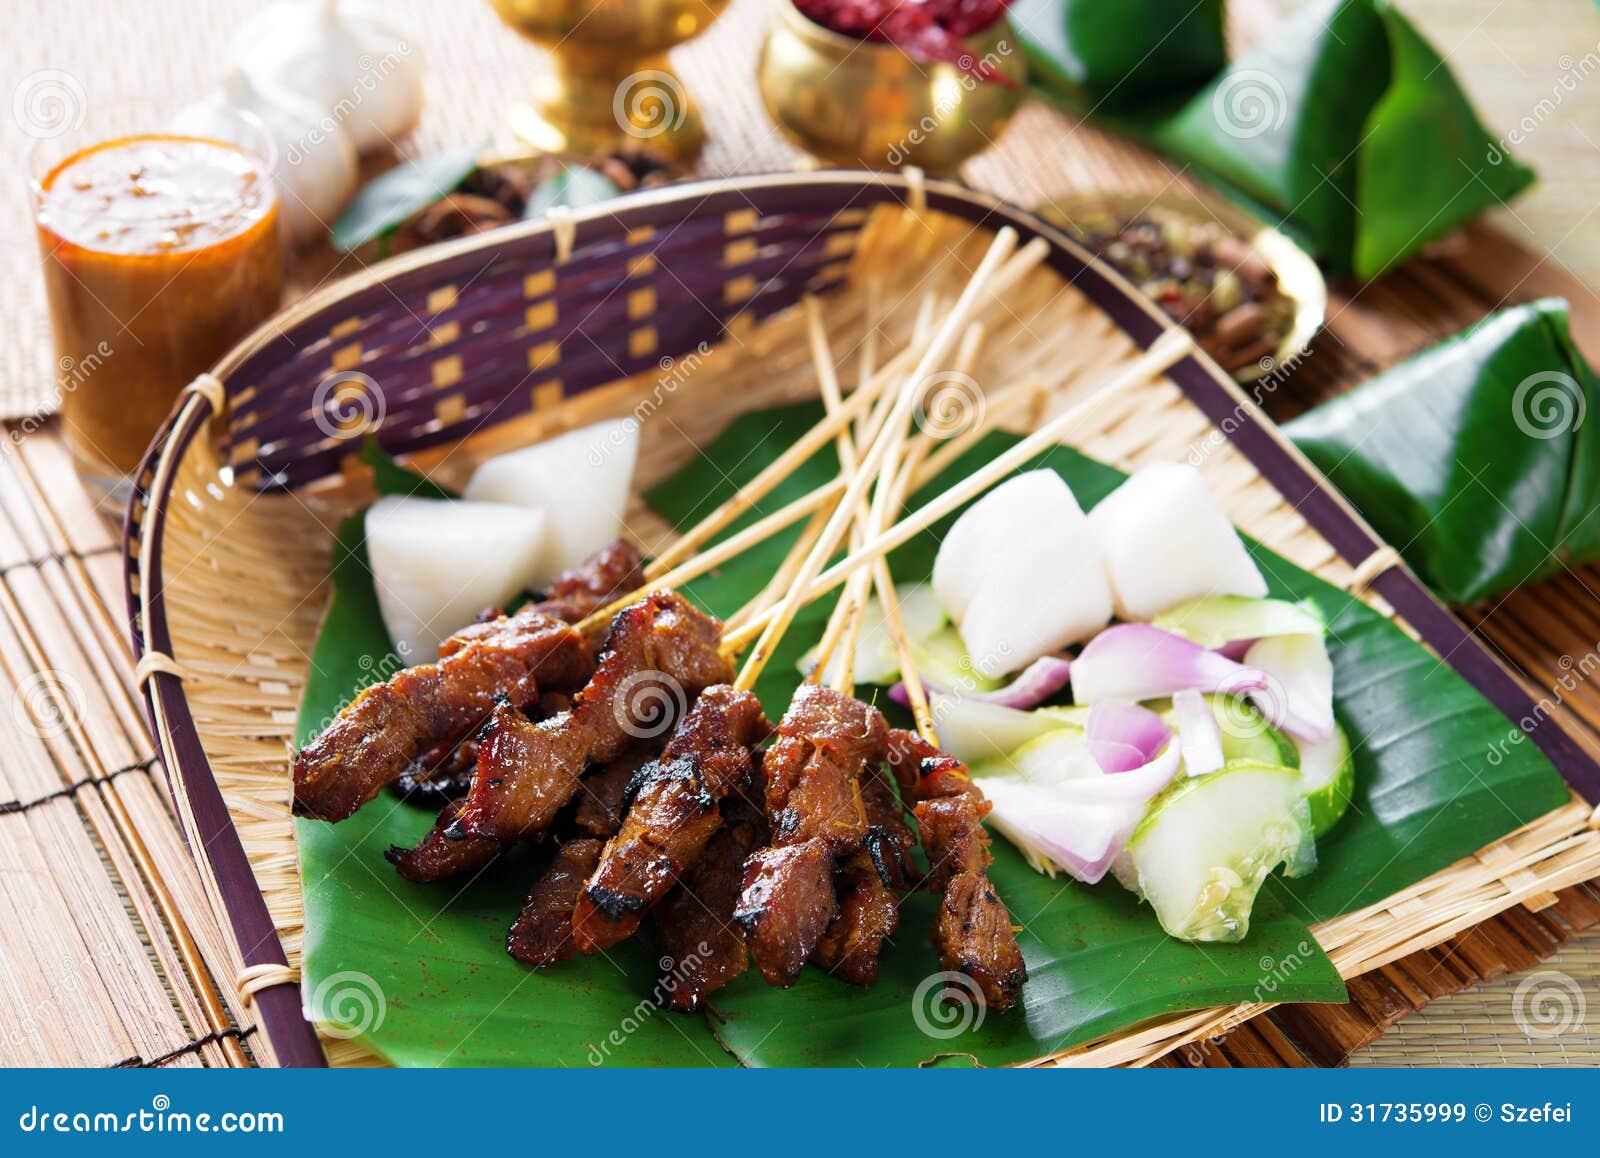 Satay Indonesia Food Royalty Free Stock Images - Image: 31735999